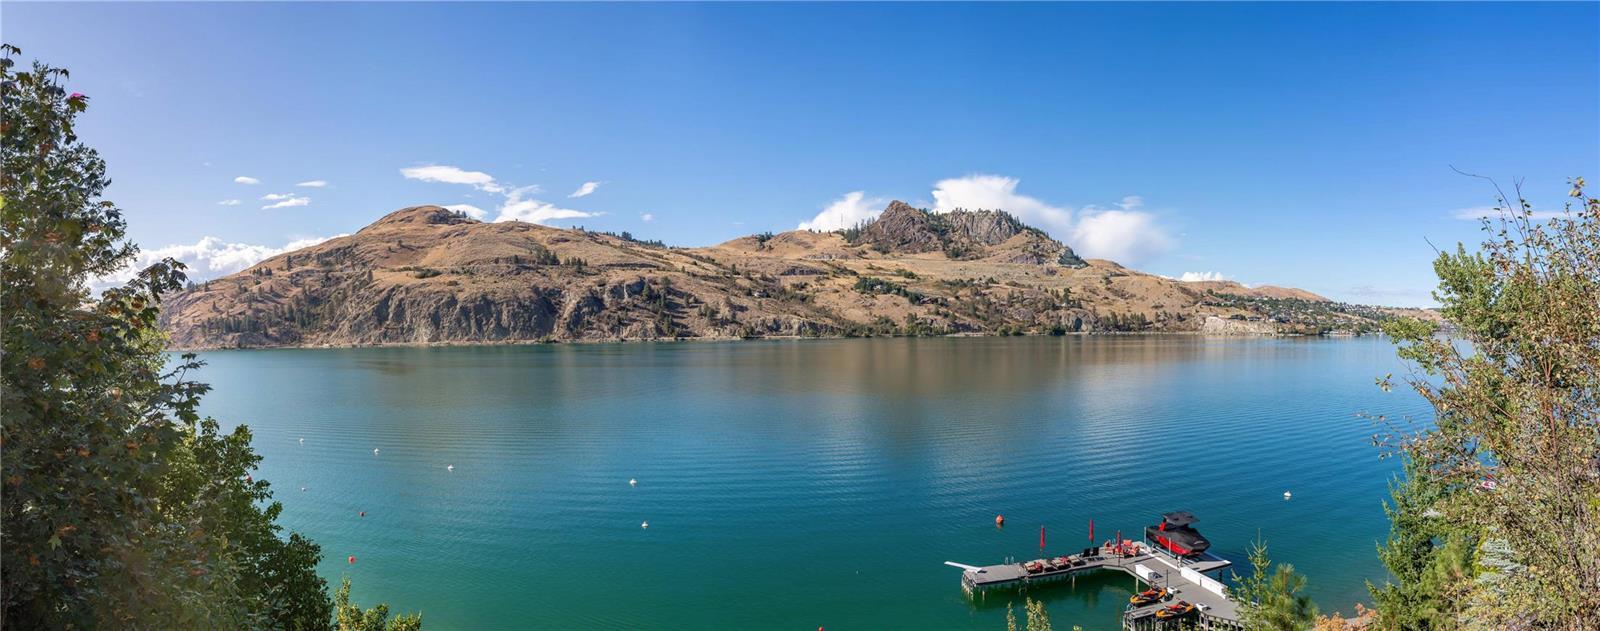 13940 Ponderosa Way,, Coldstream, British Columbia  V1B 1A4 - Photo 9 - 10216769